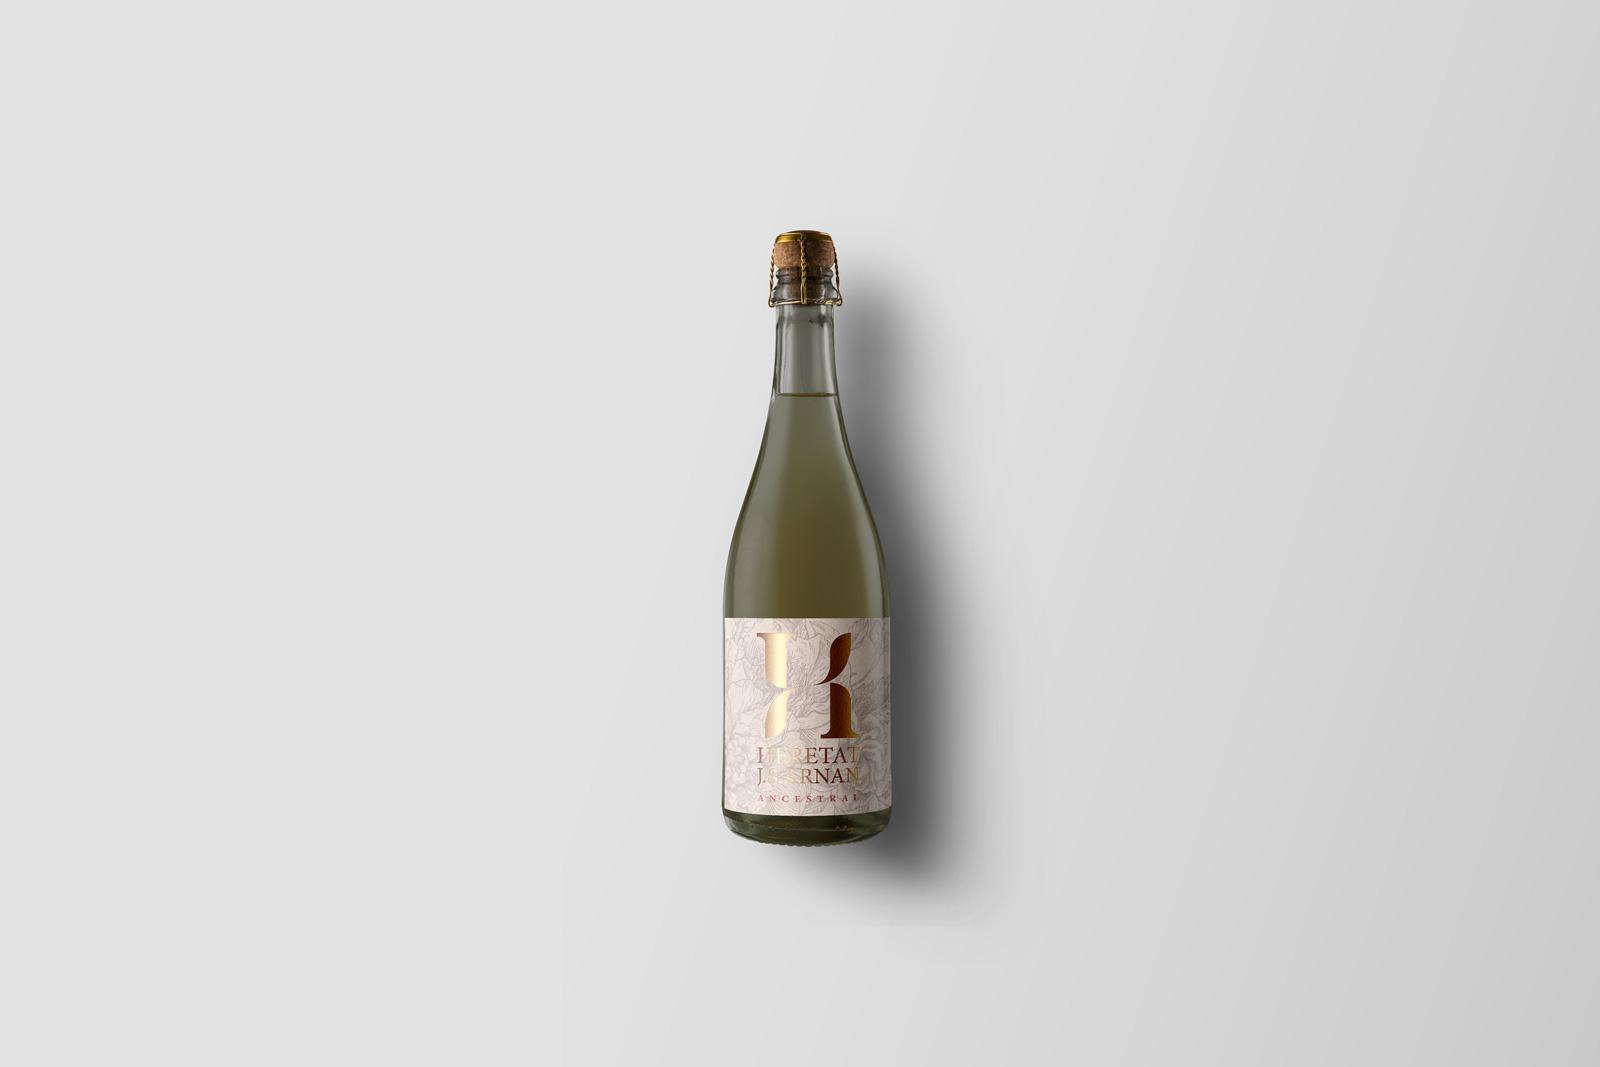 etiqueta para vino Ancestral